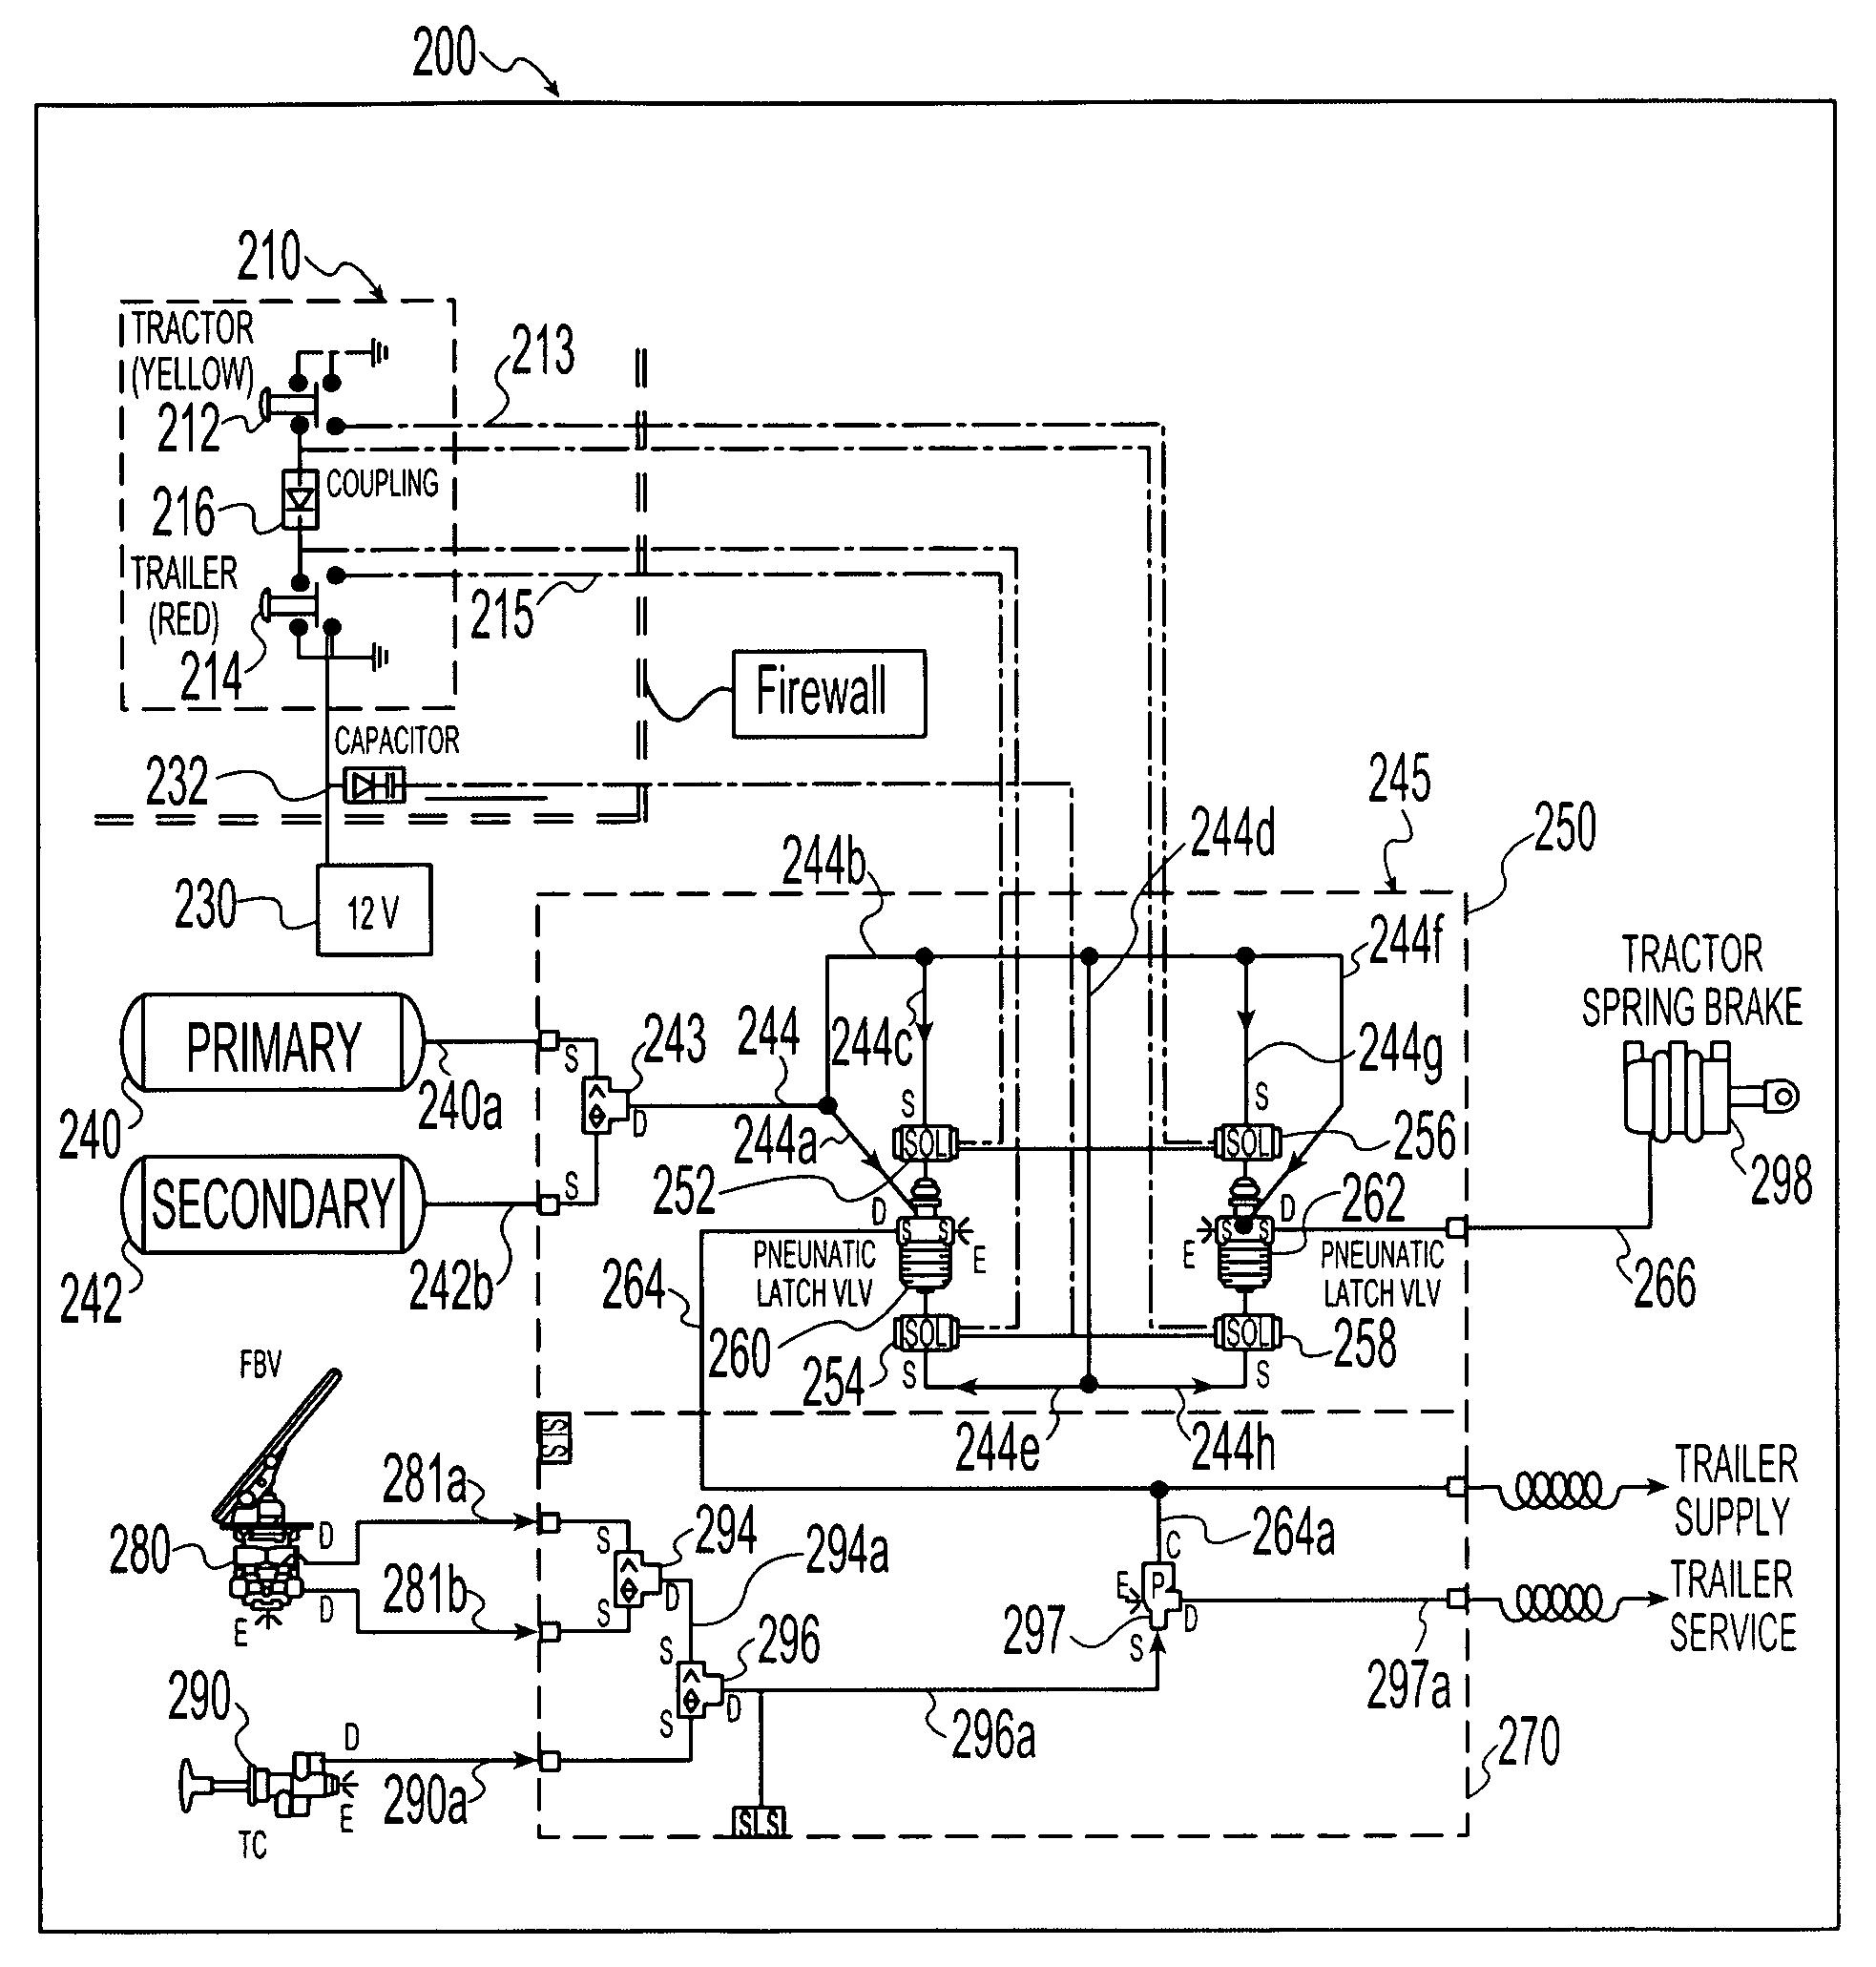 haldex abs wiring diagram wiring diagram nowsemi trailer wiring diagram with abs somurich com allison automatic transmission wiring diagram haldex abs wiring diagram